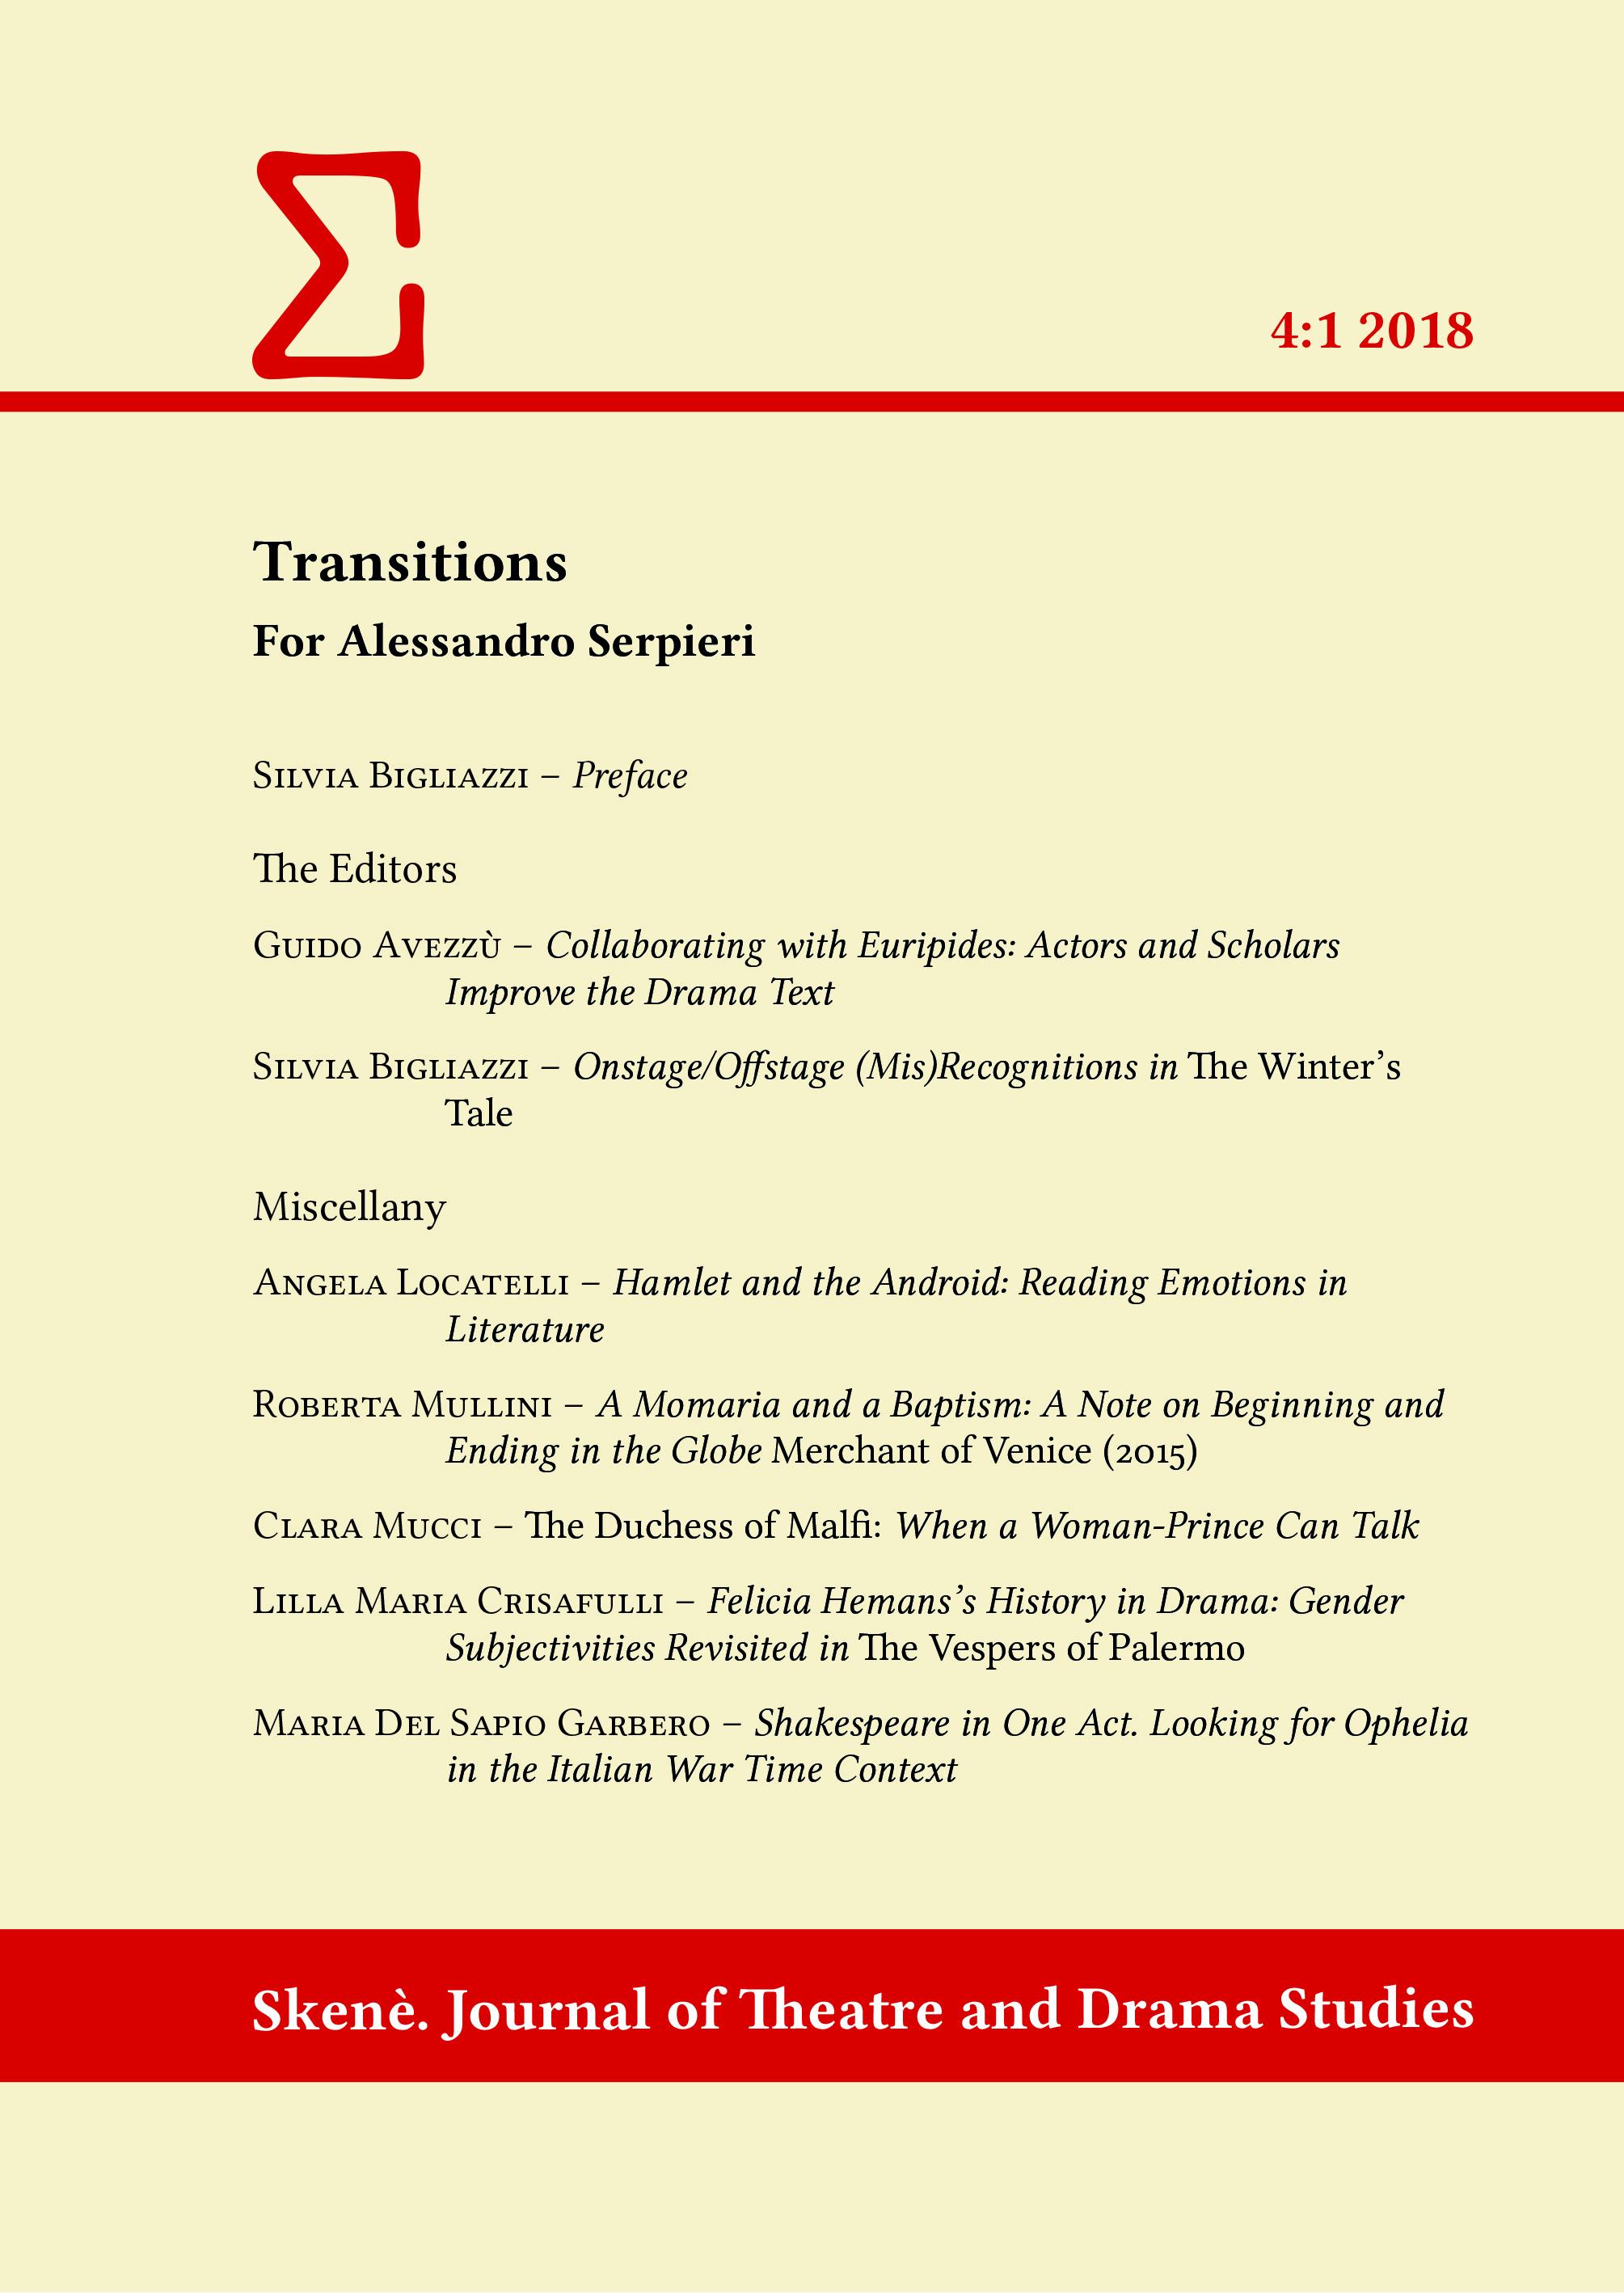 Skenè 4.1 cover